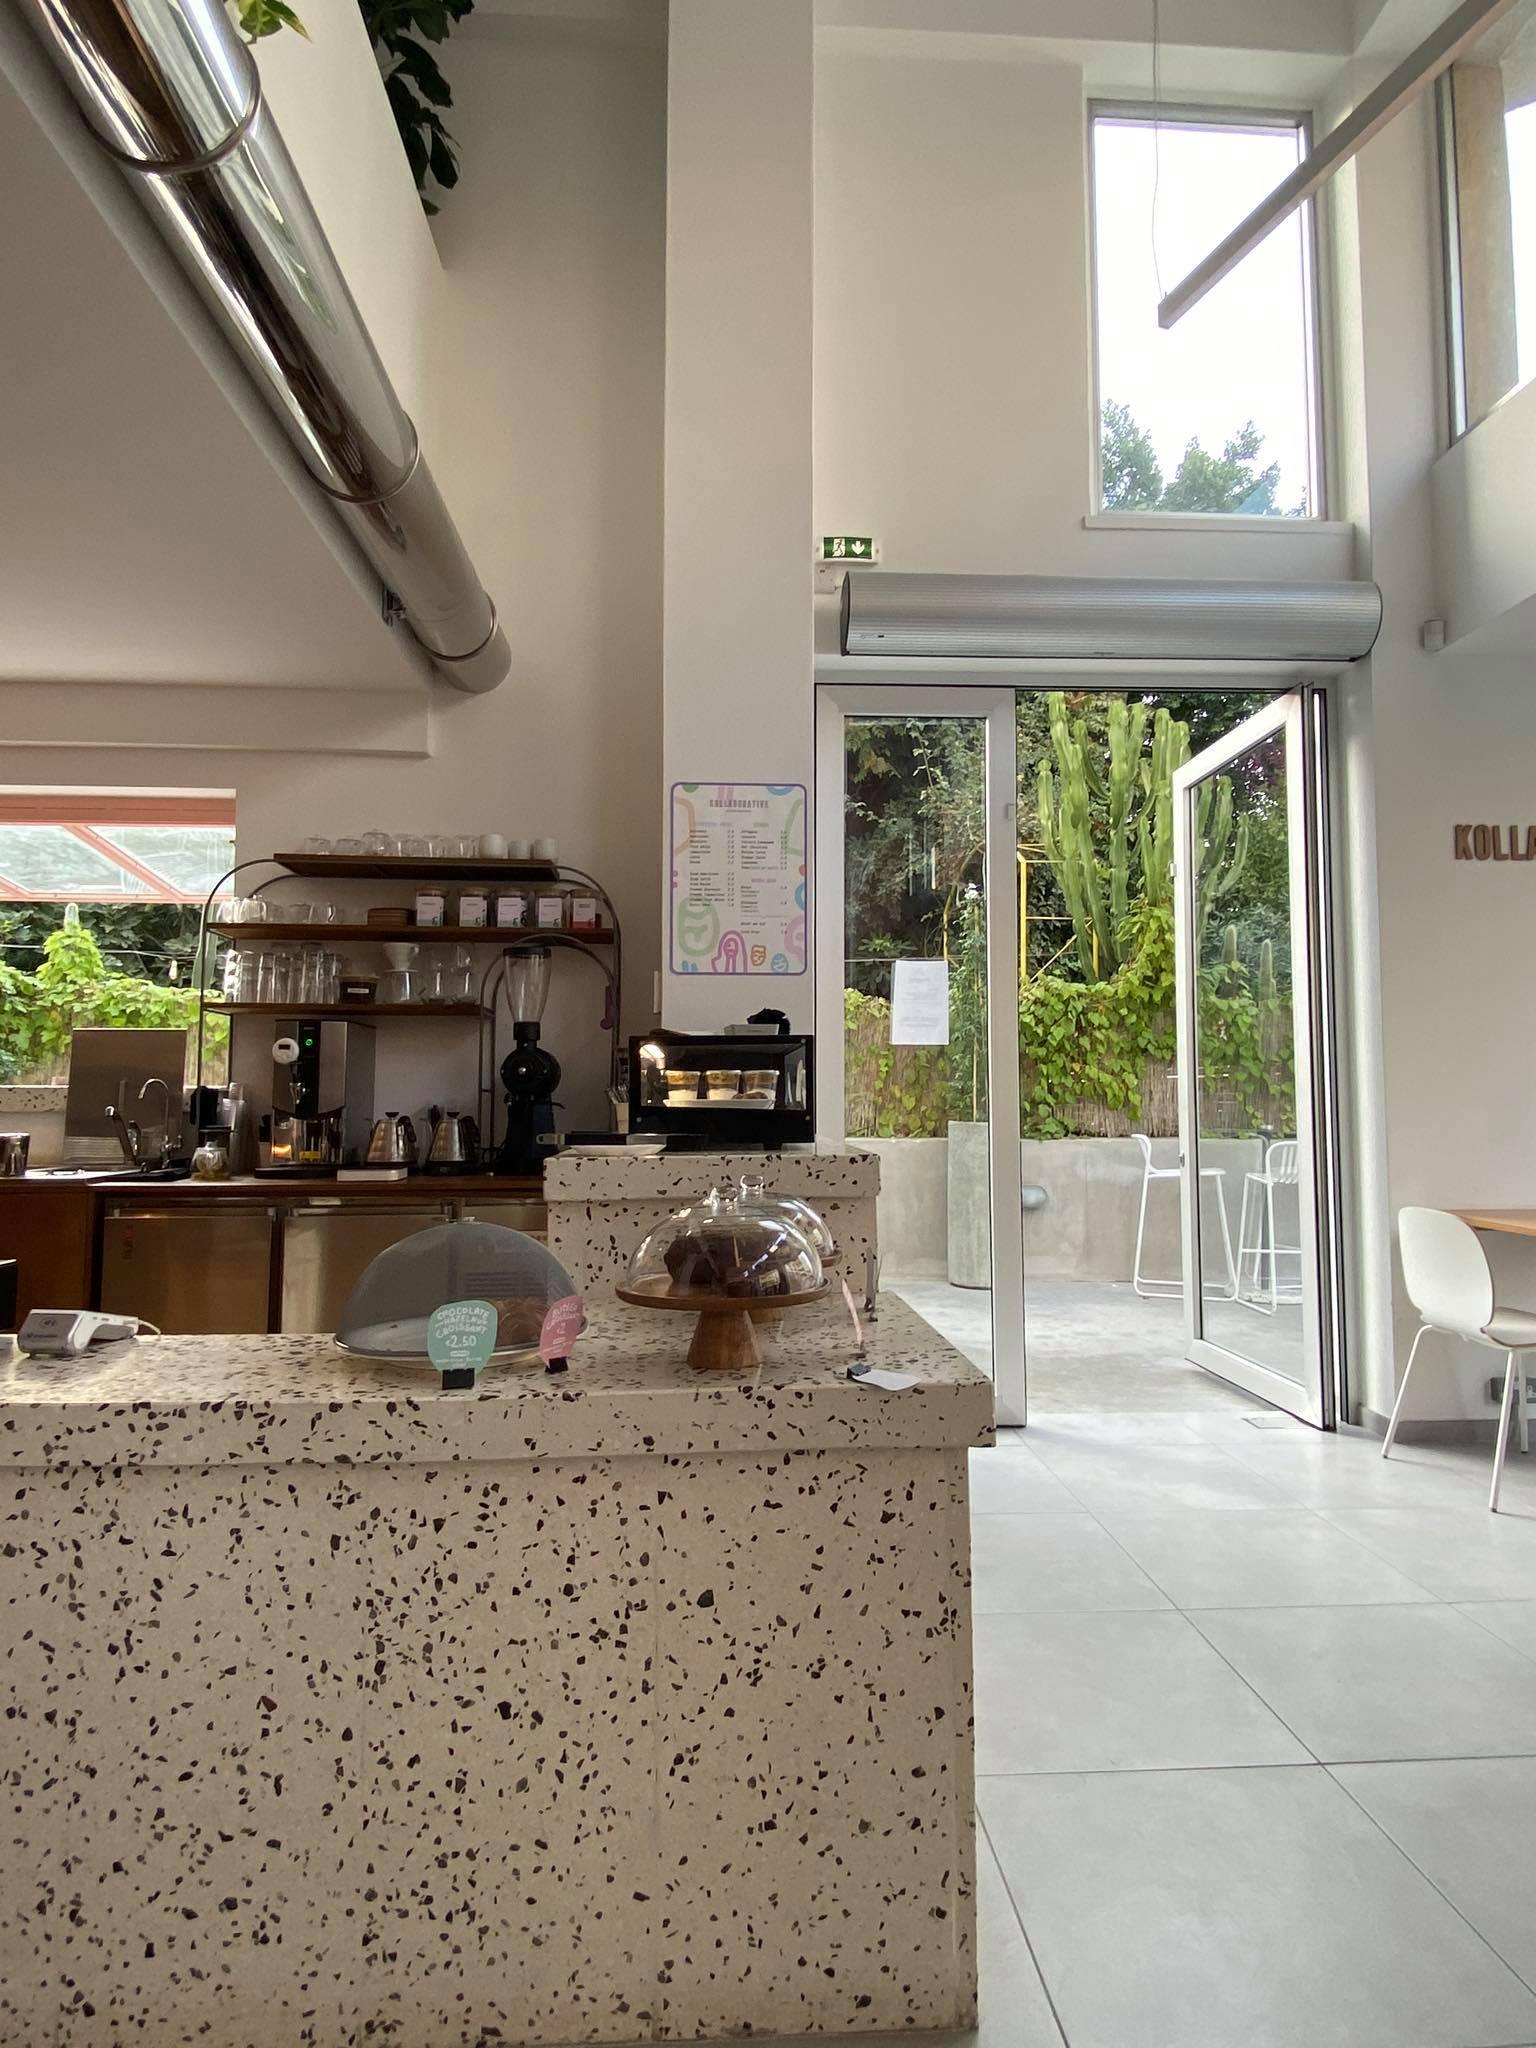 Kollaborative Coffee Roasters: To νέο coffee spot της Λευκωσίας